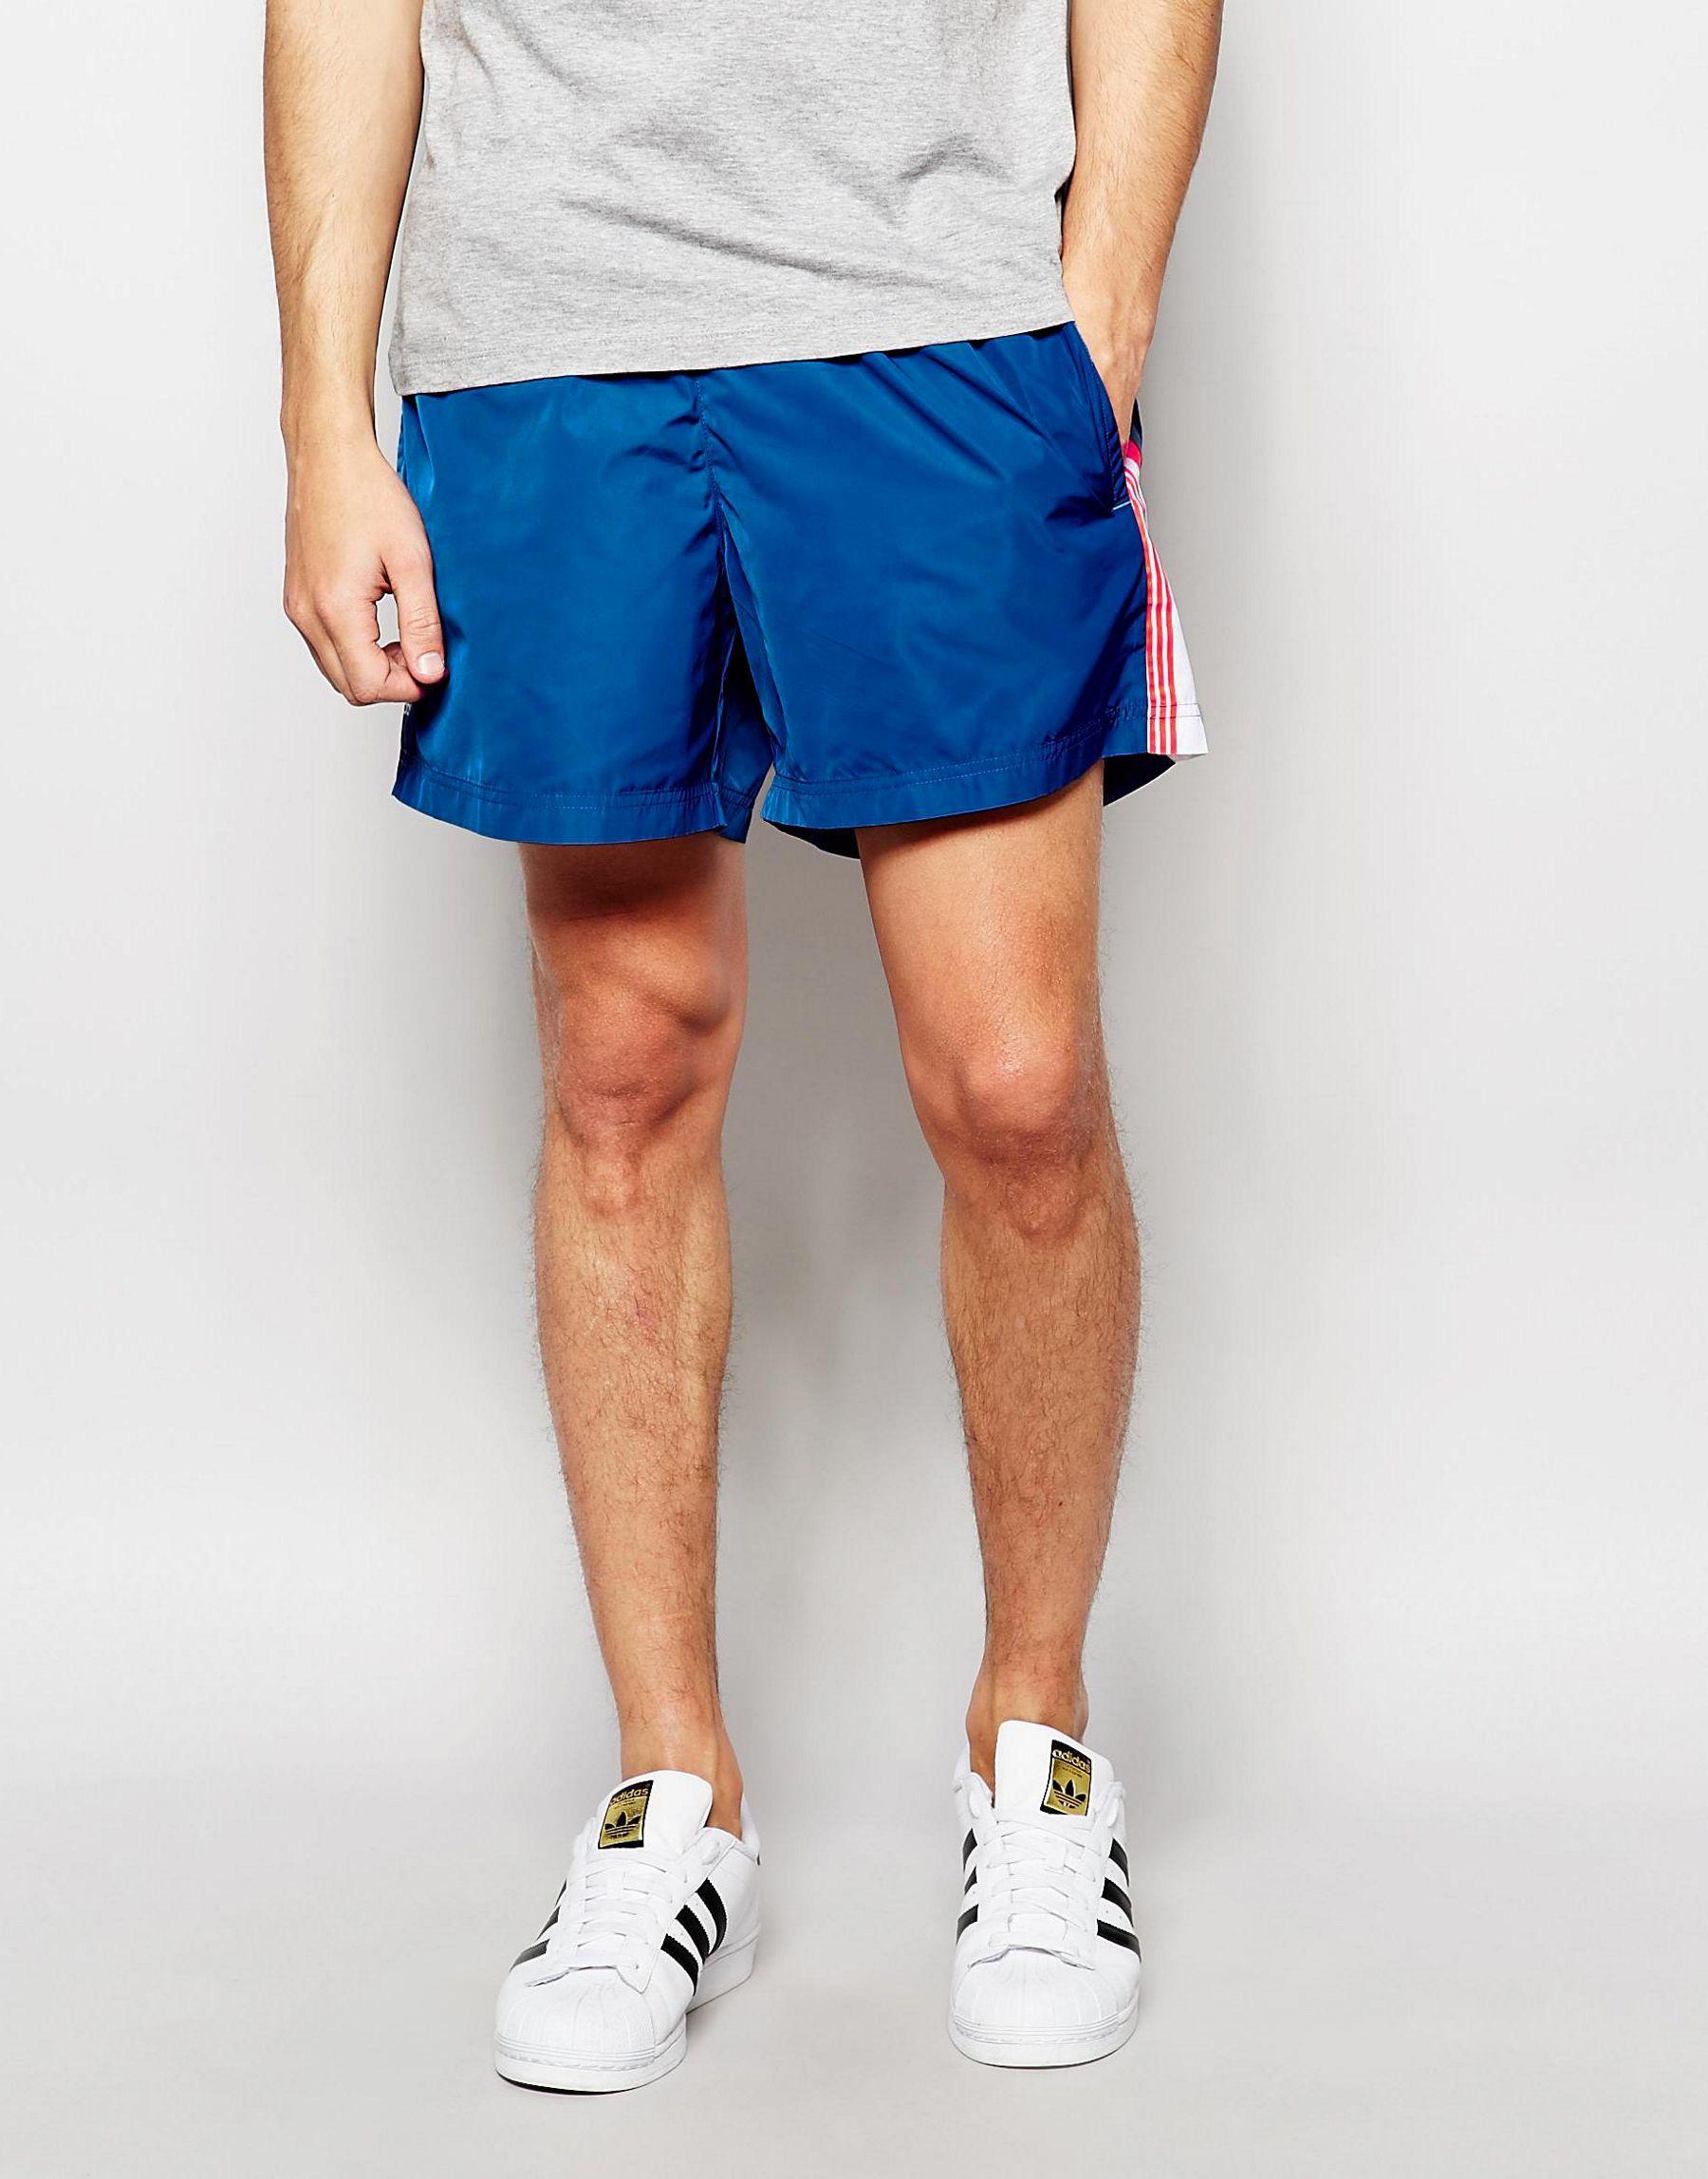 adidas classic shorts